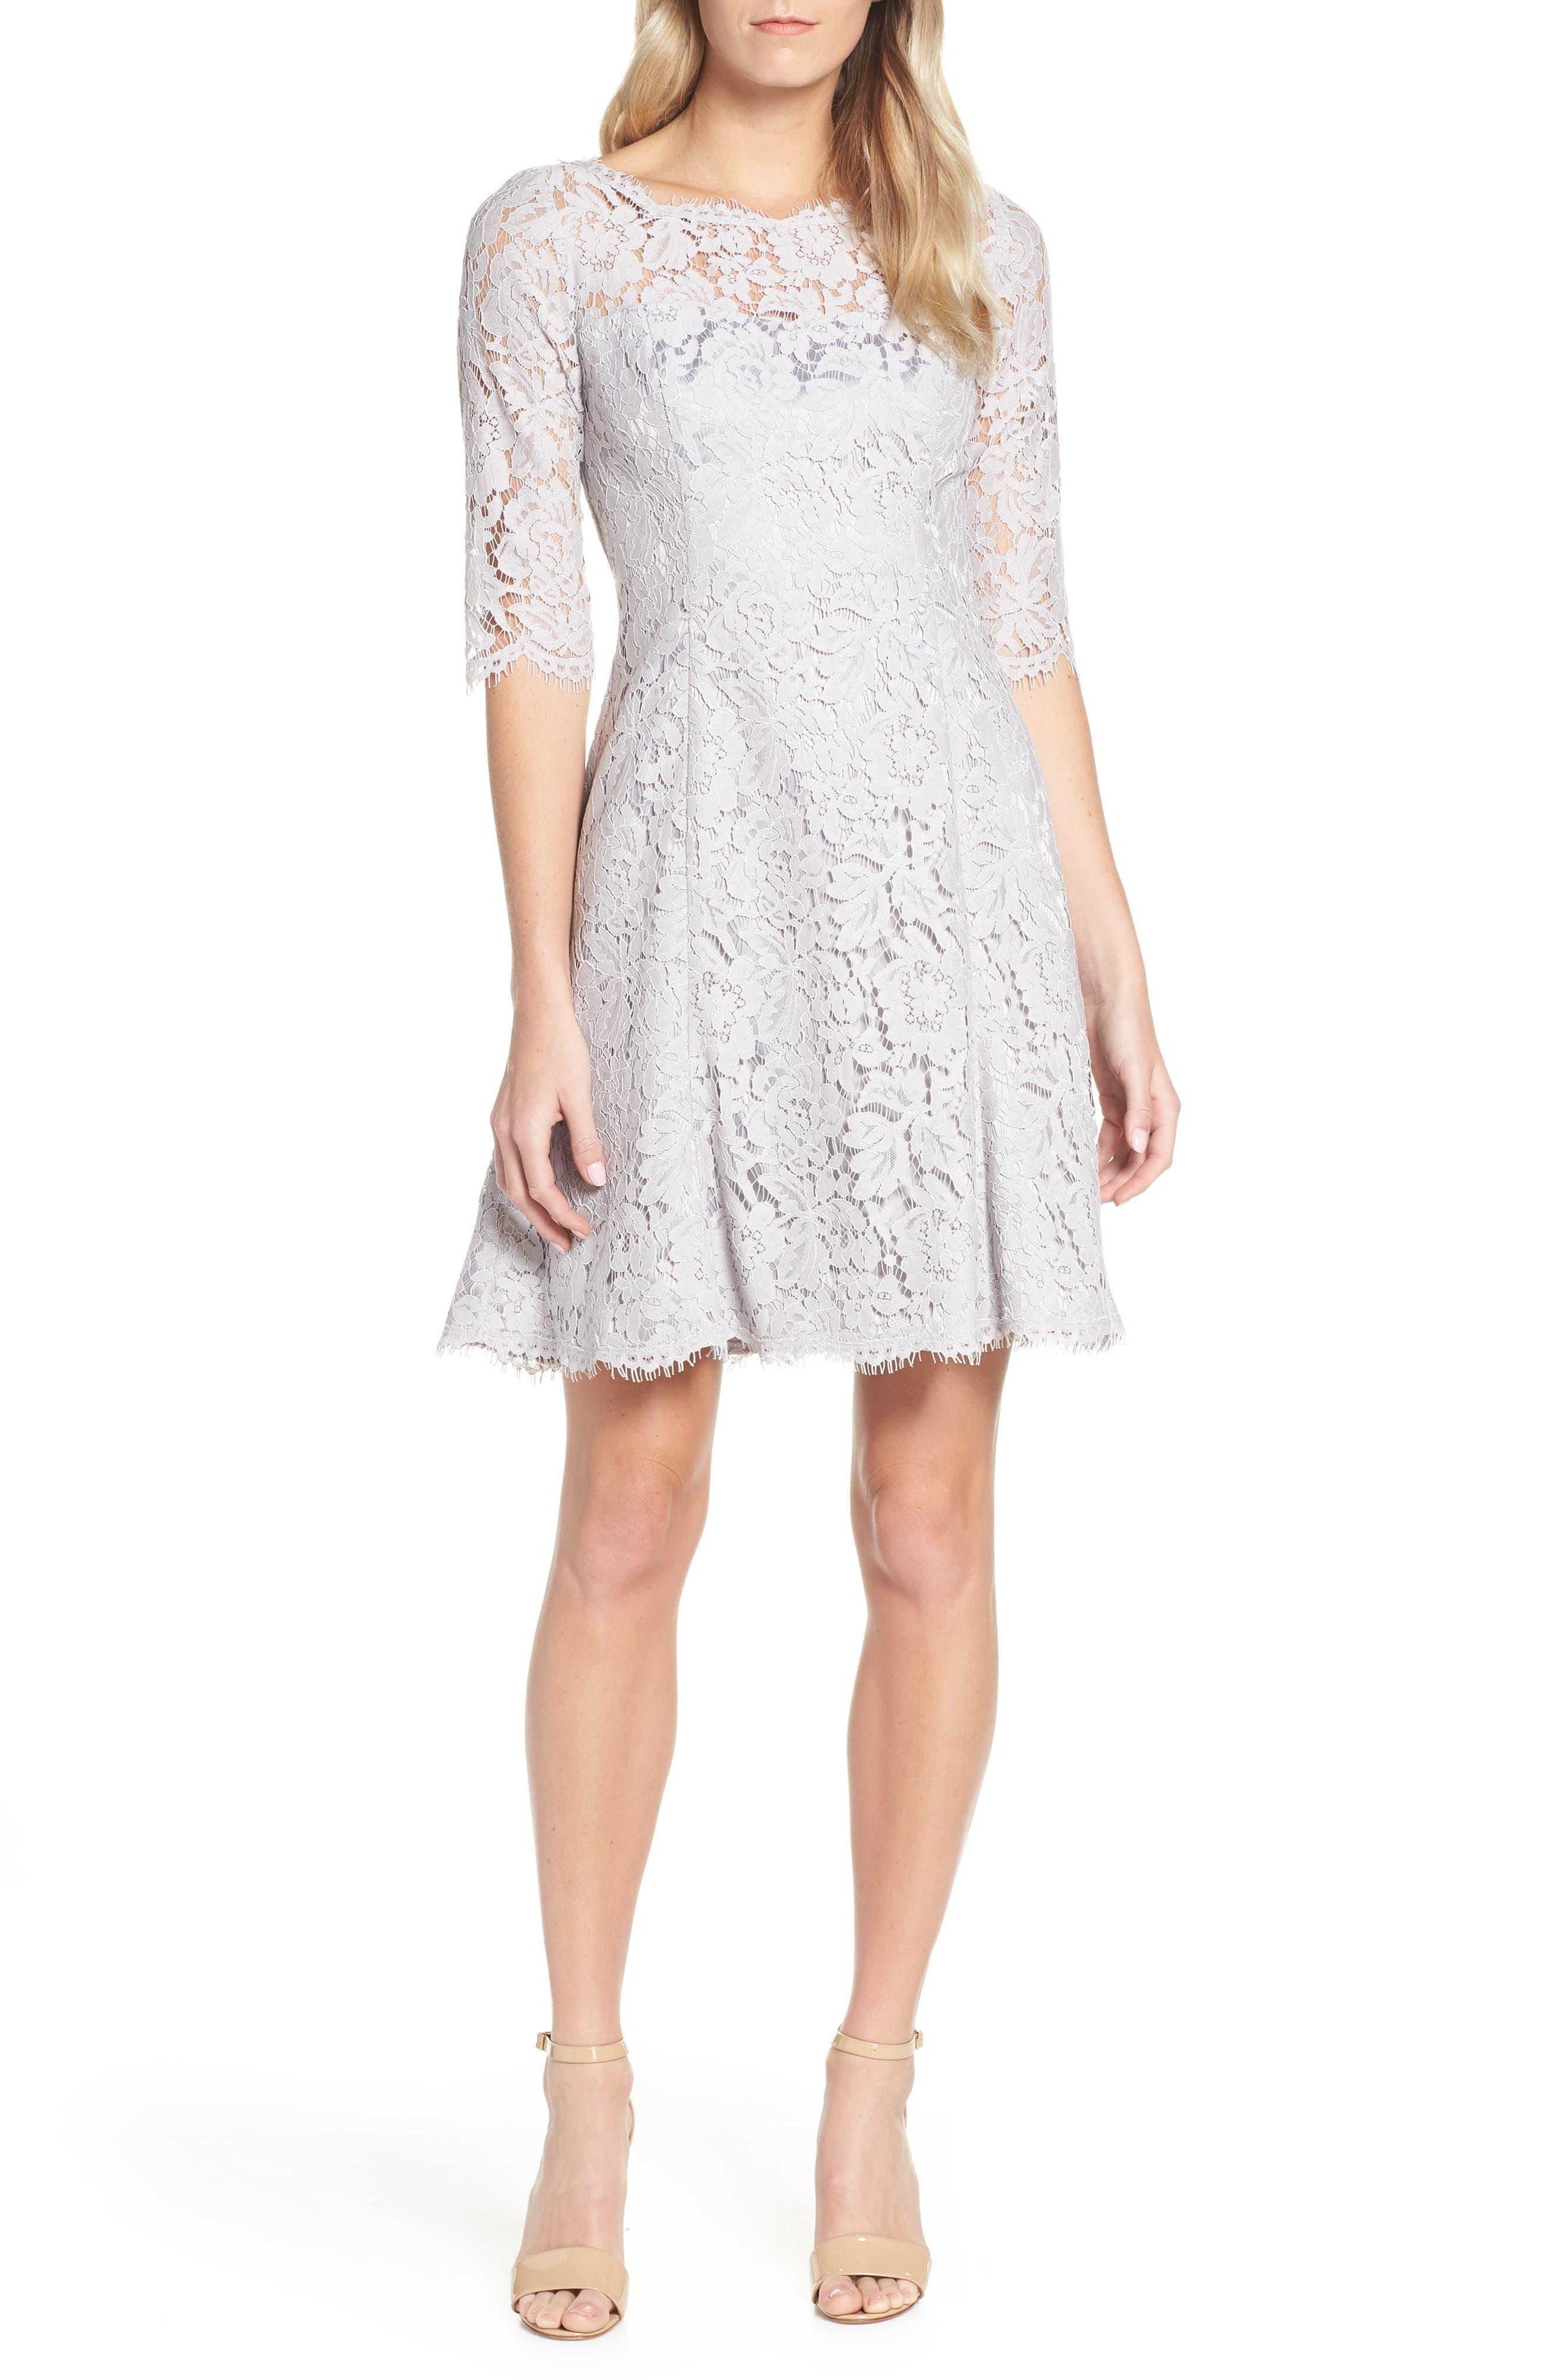 ELIZA J,                             Lace Fit & Flare Cocktail Dress,                             Main thumbnail 1, color,                             GREY